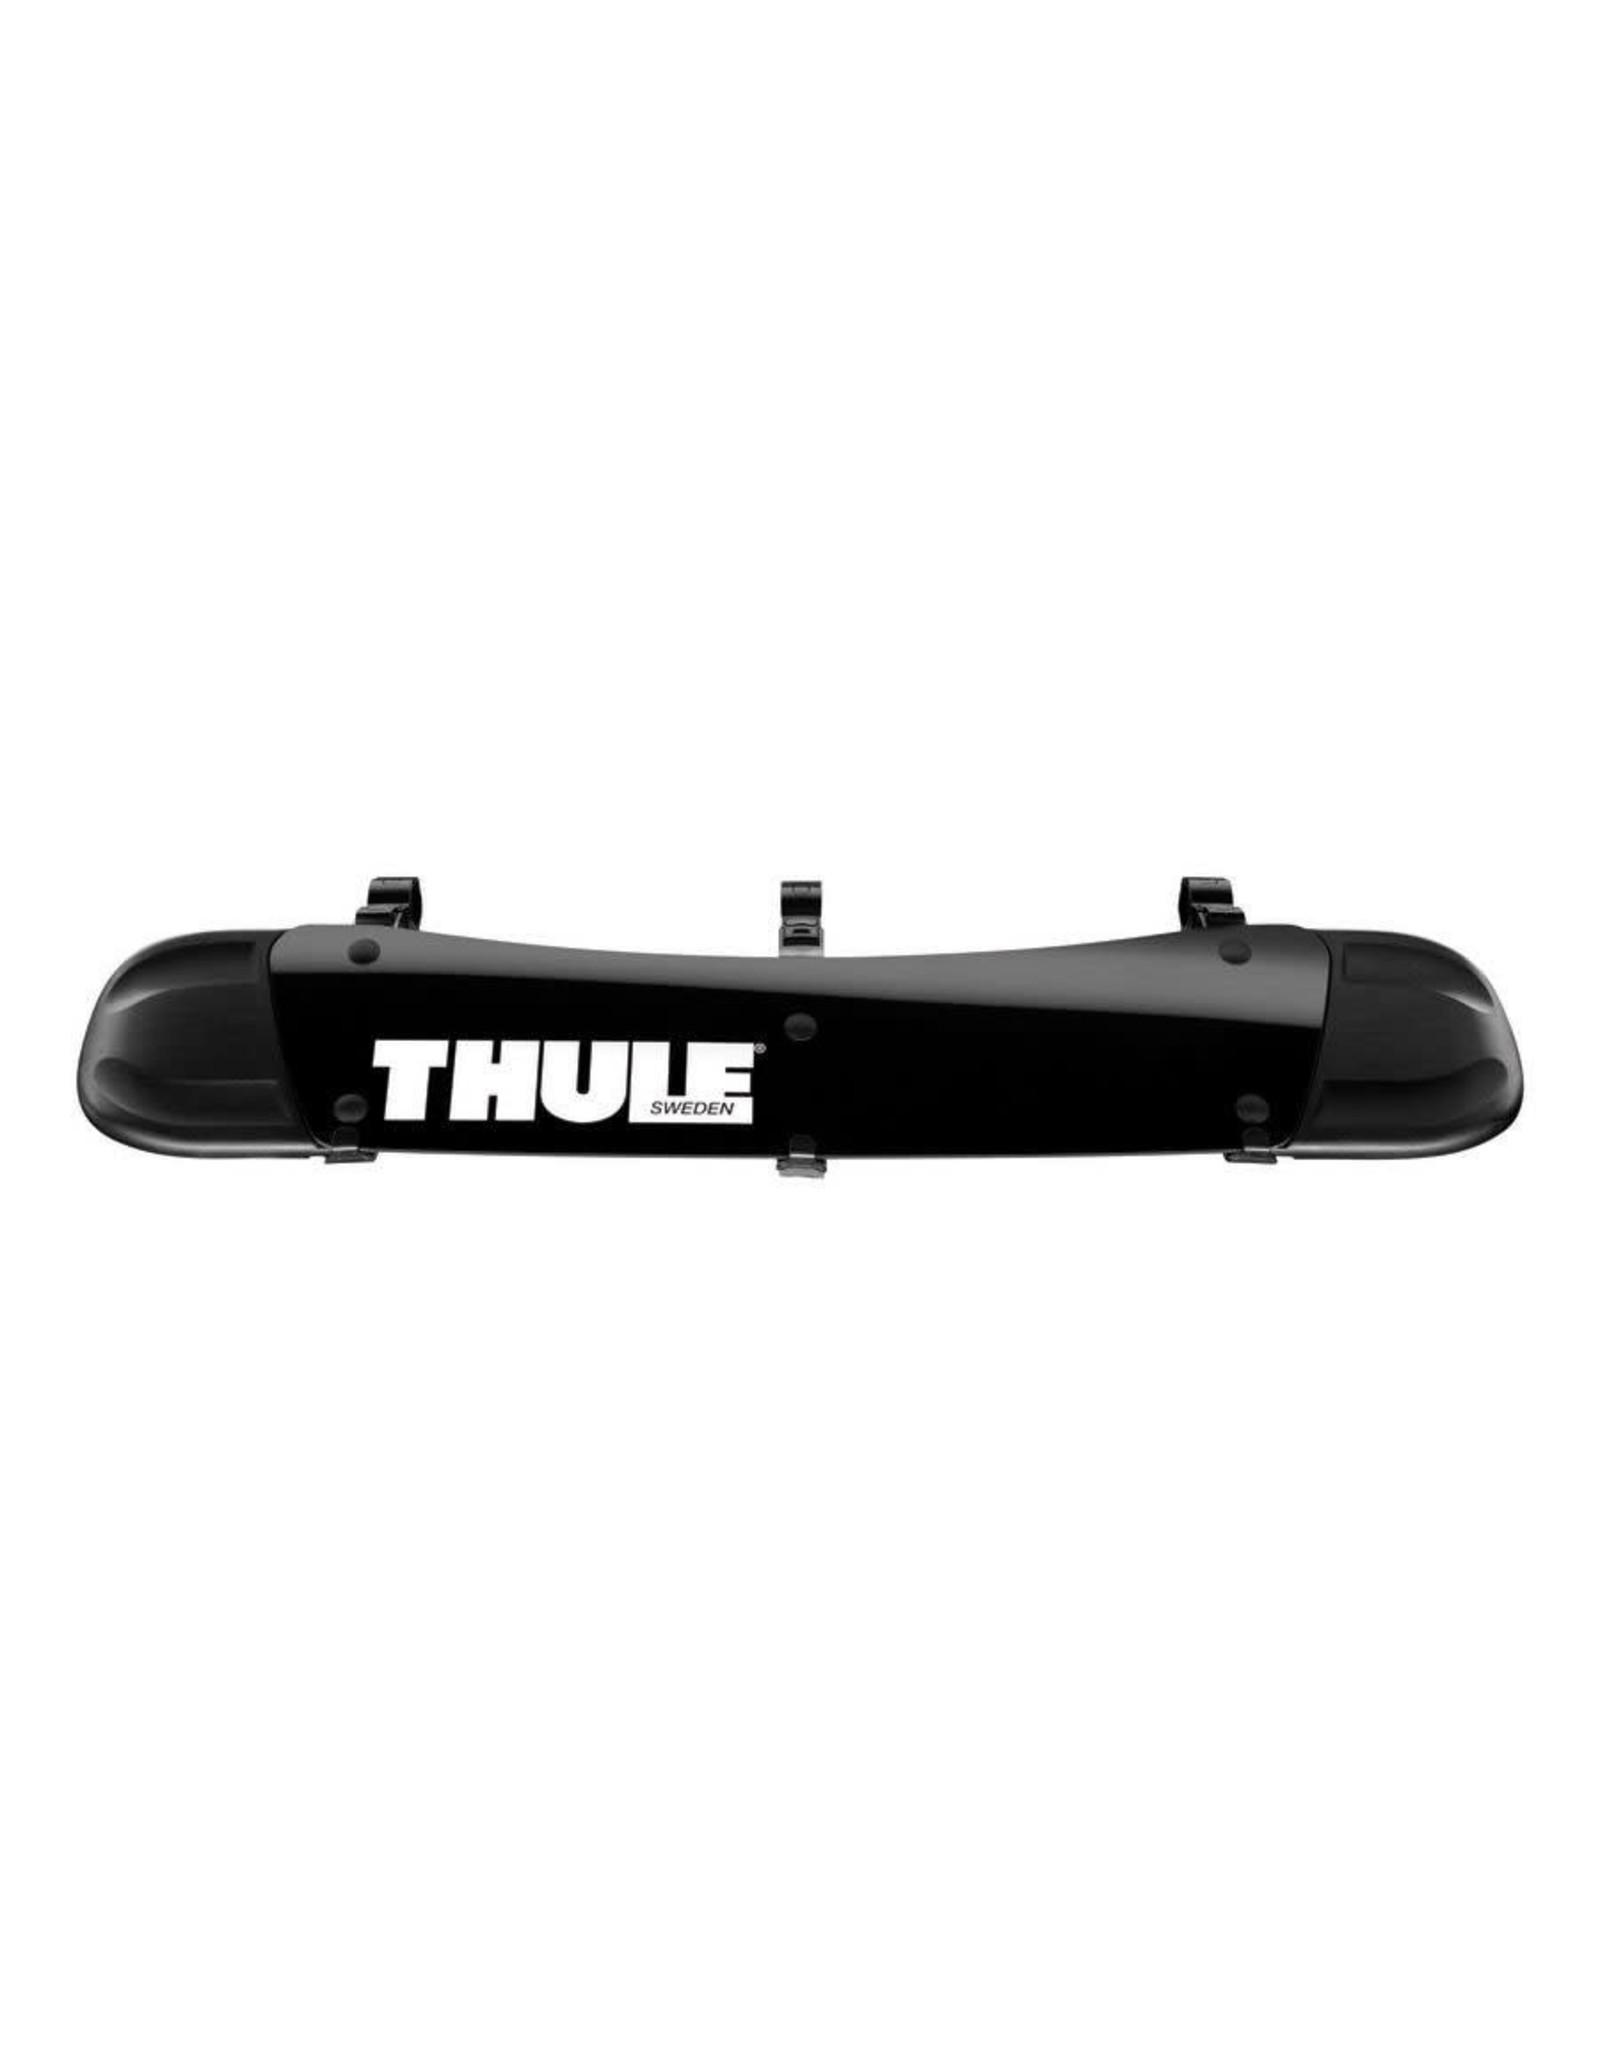 Thule The Thule 8702 AirScreen - 44 Inch